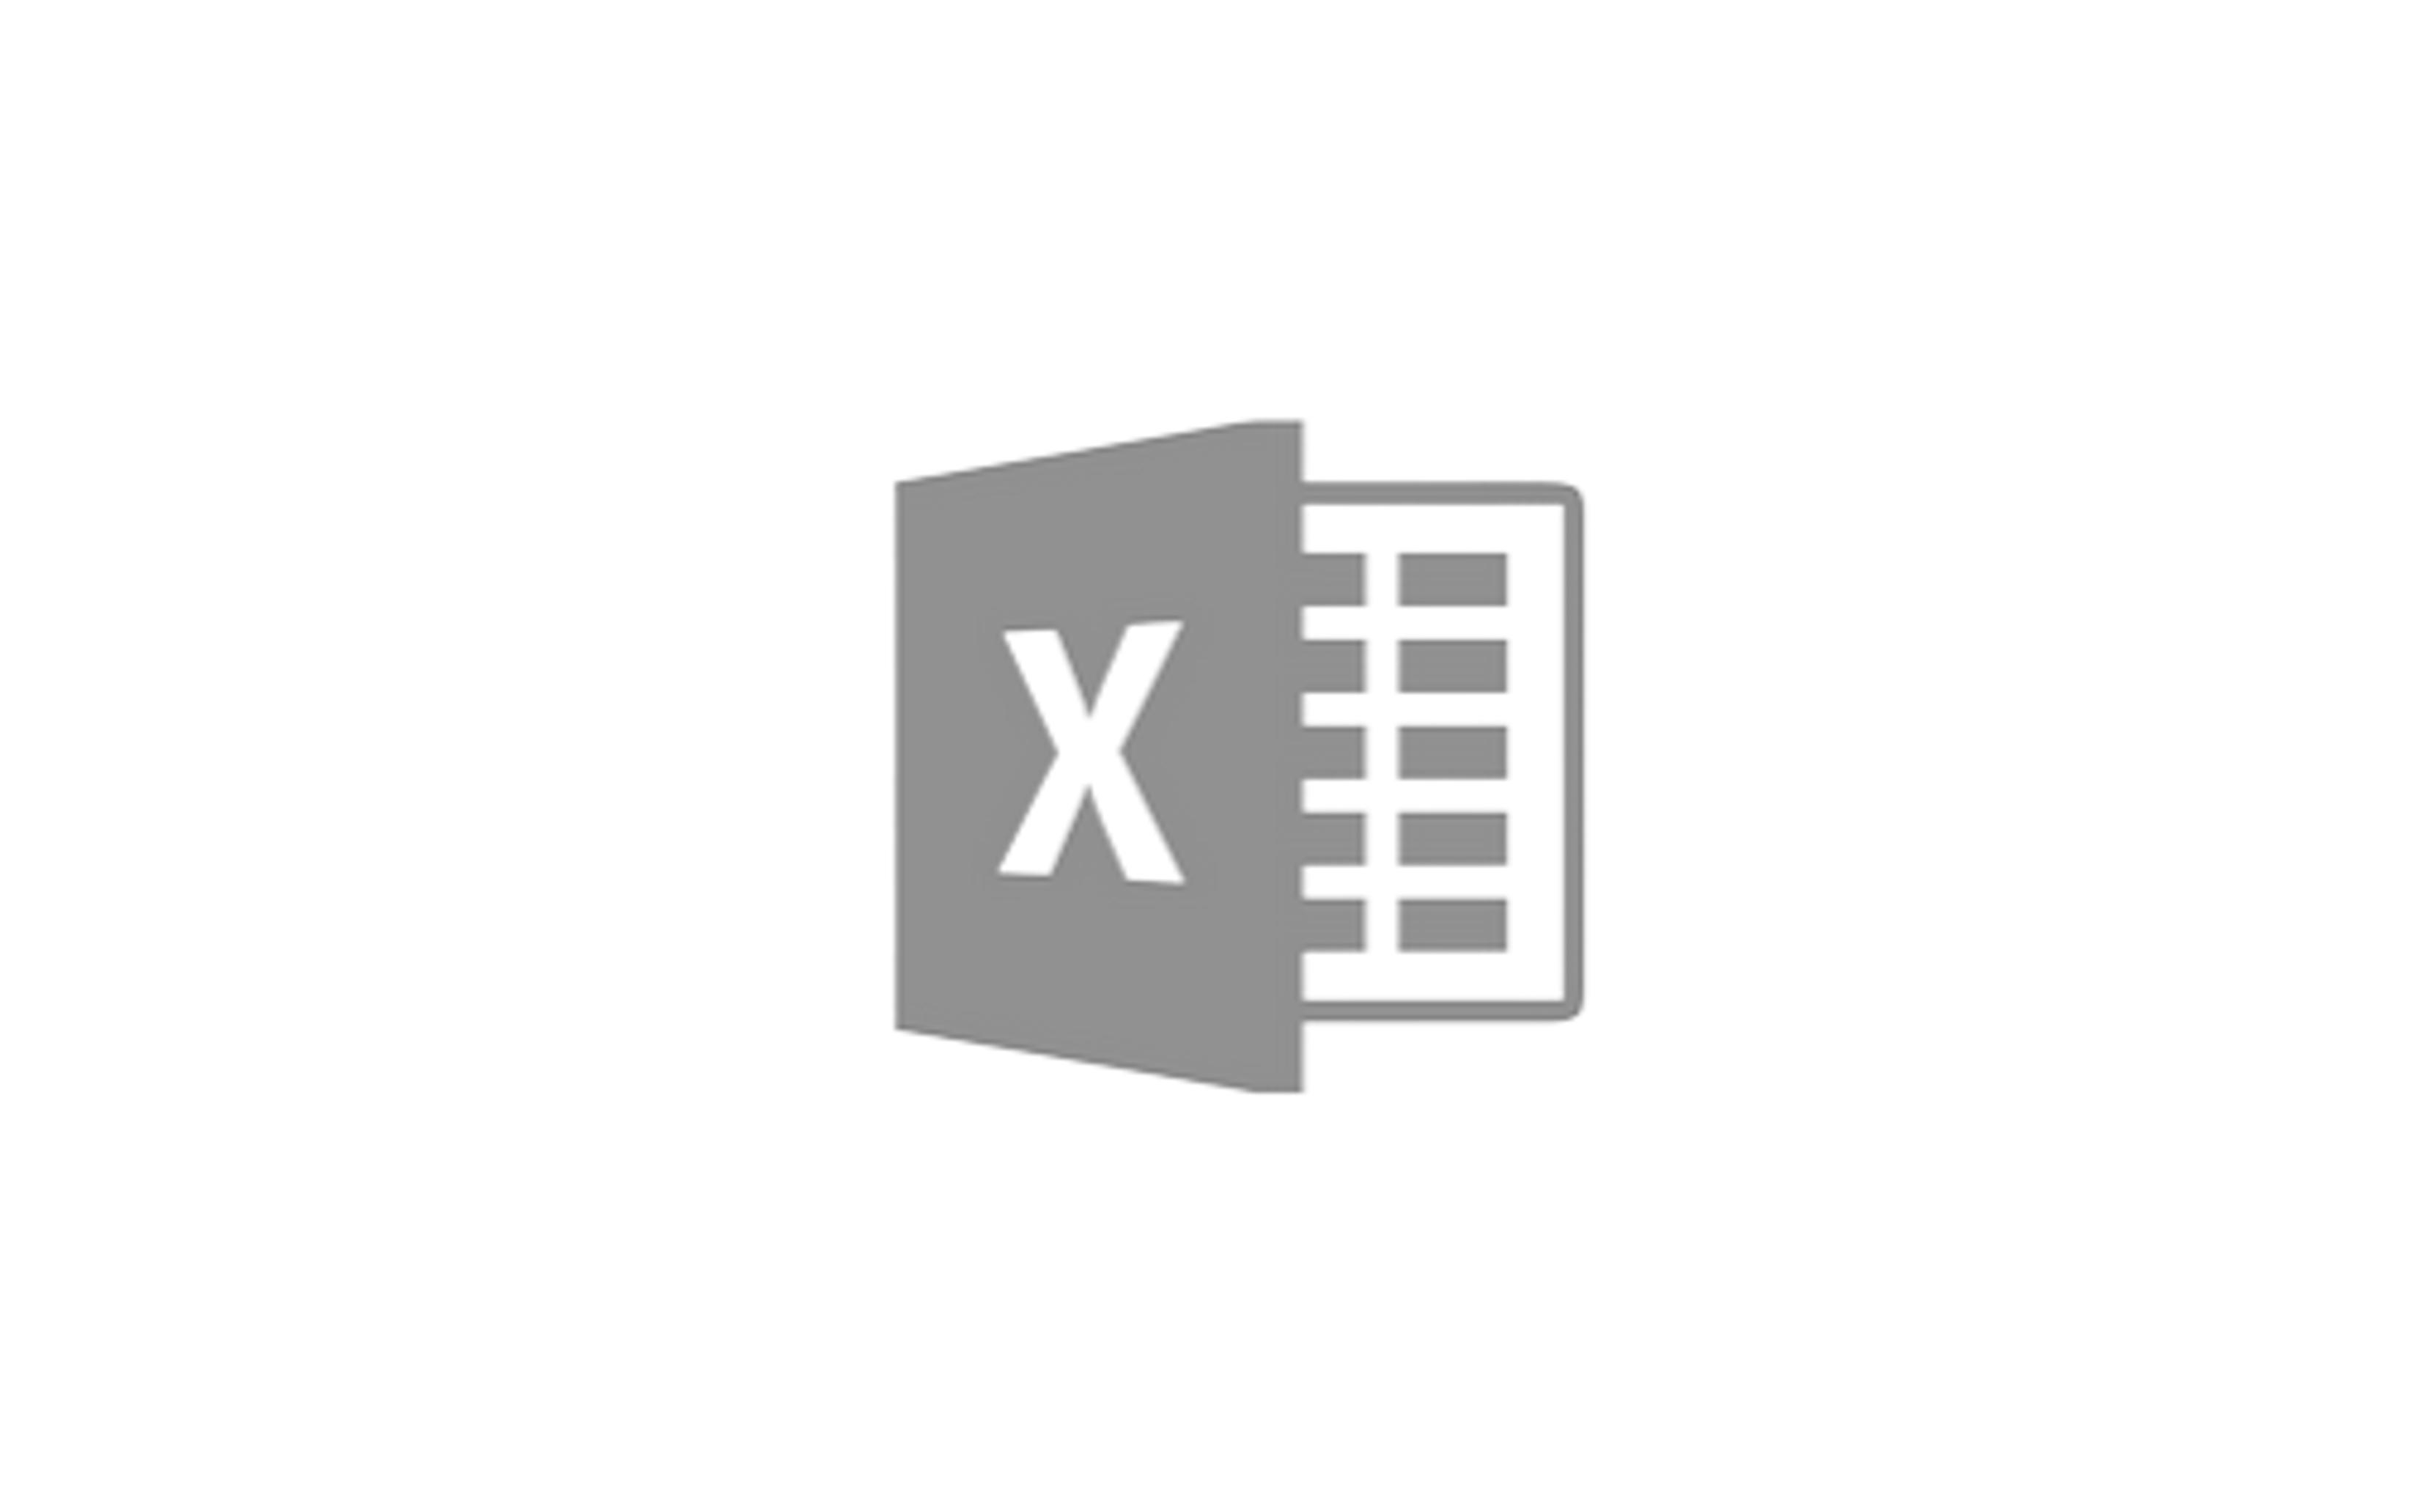 Excel 로고